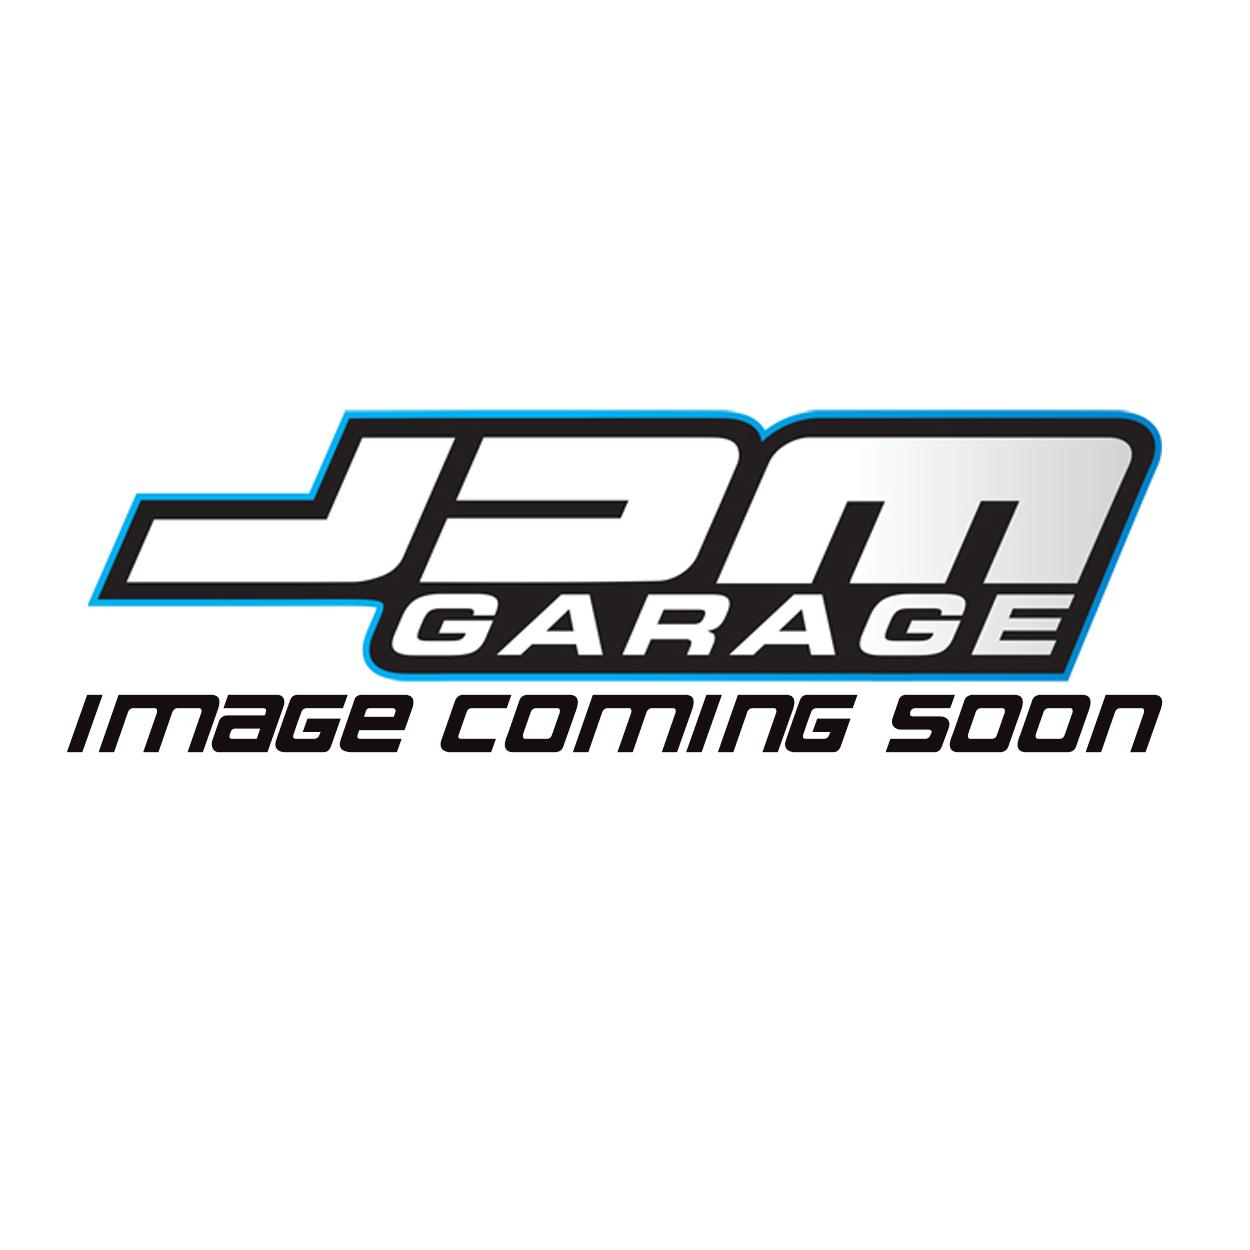 HKB Steering Wheel Boss Kit for Toyota Supra JZA80/Soarer ZZ30/Aristo & Lexus GS300 - OT-163